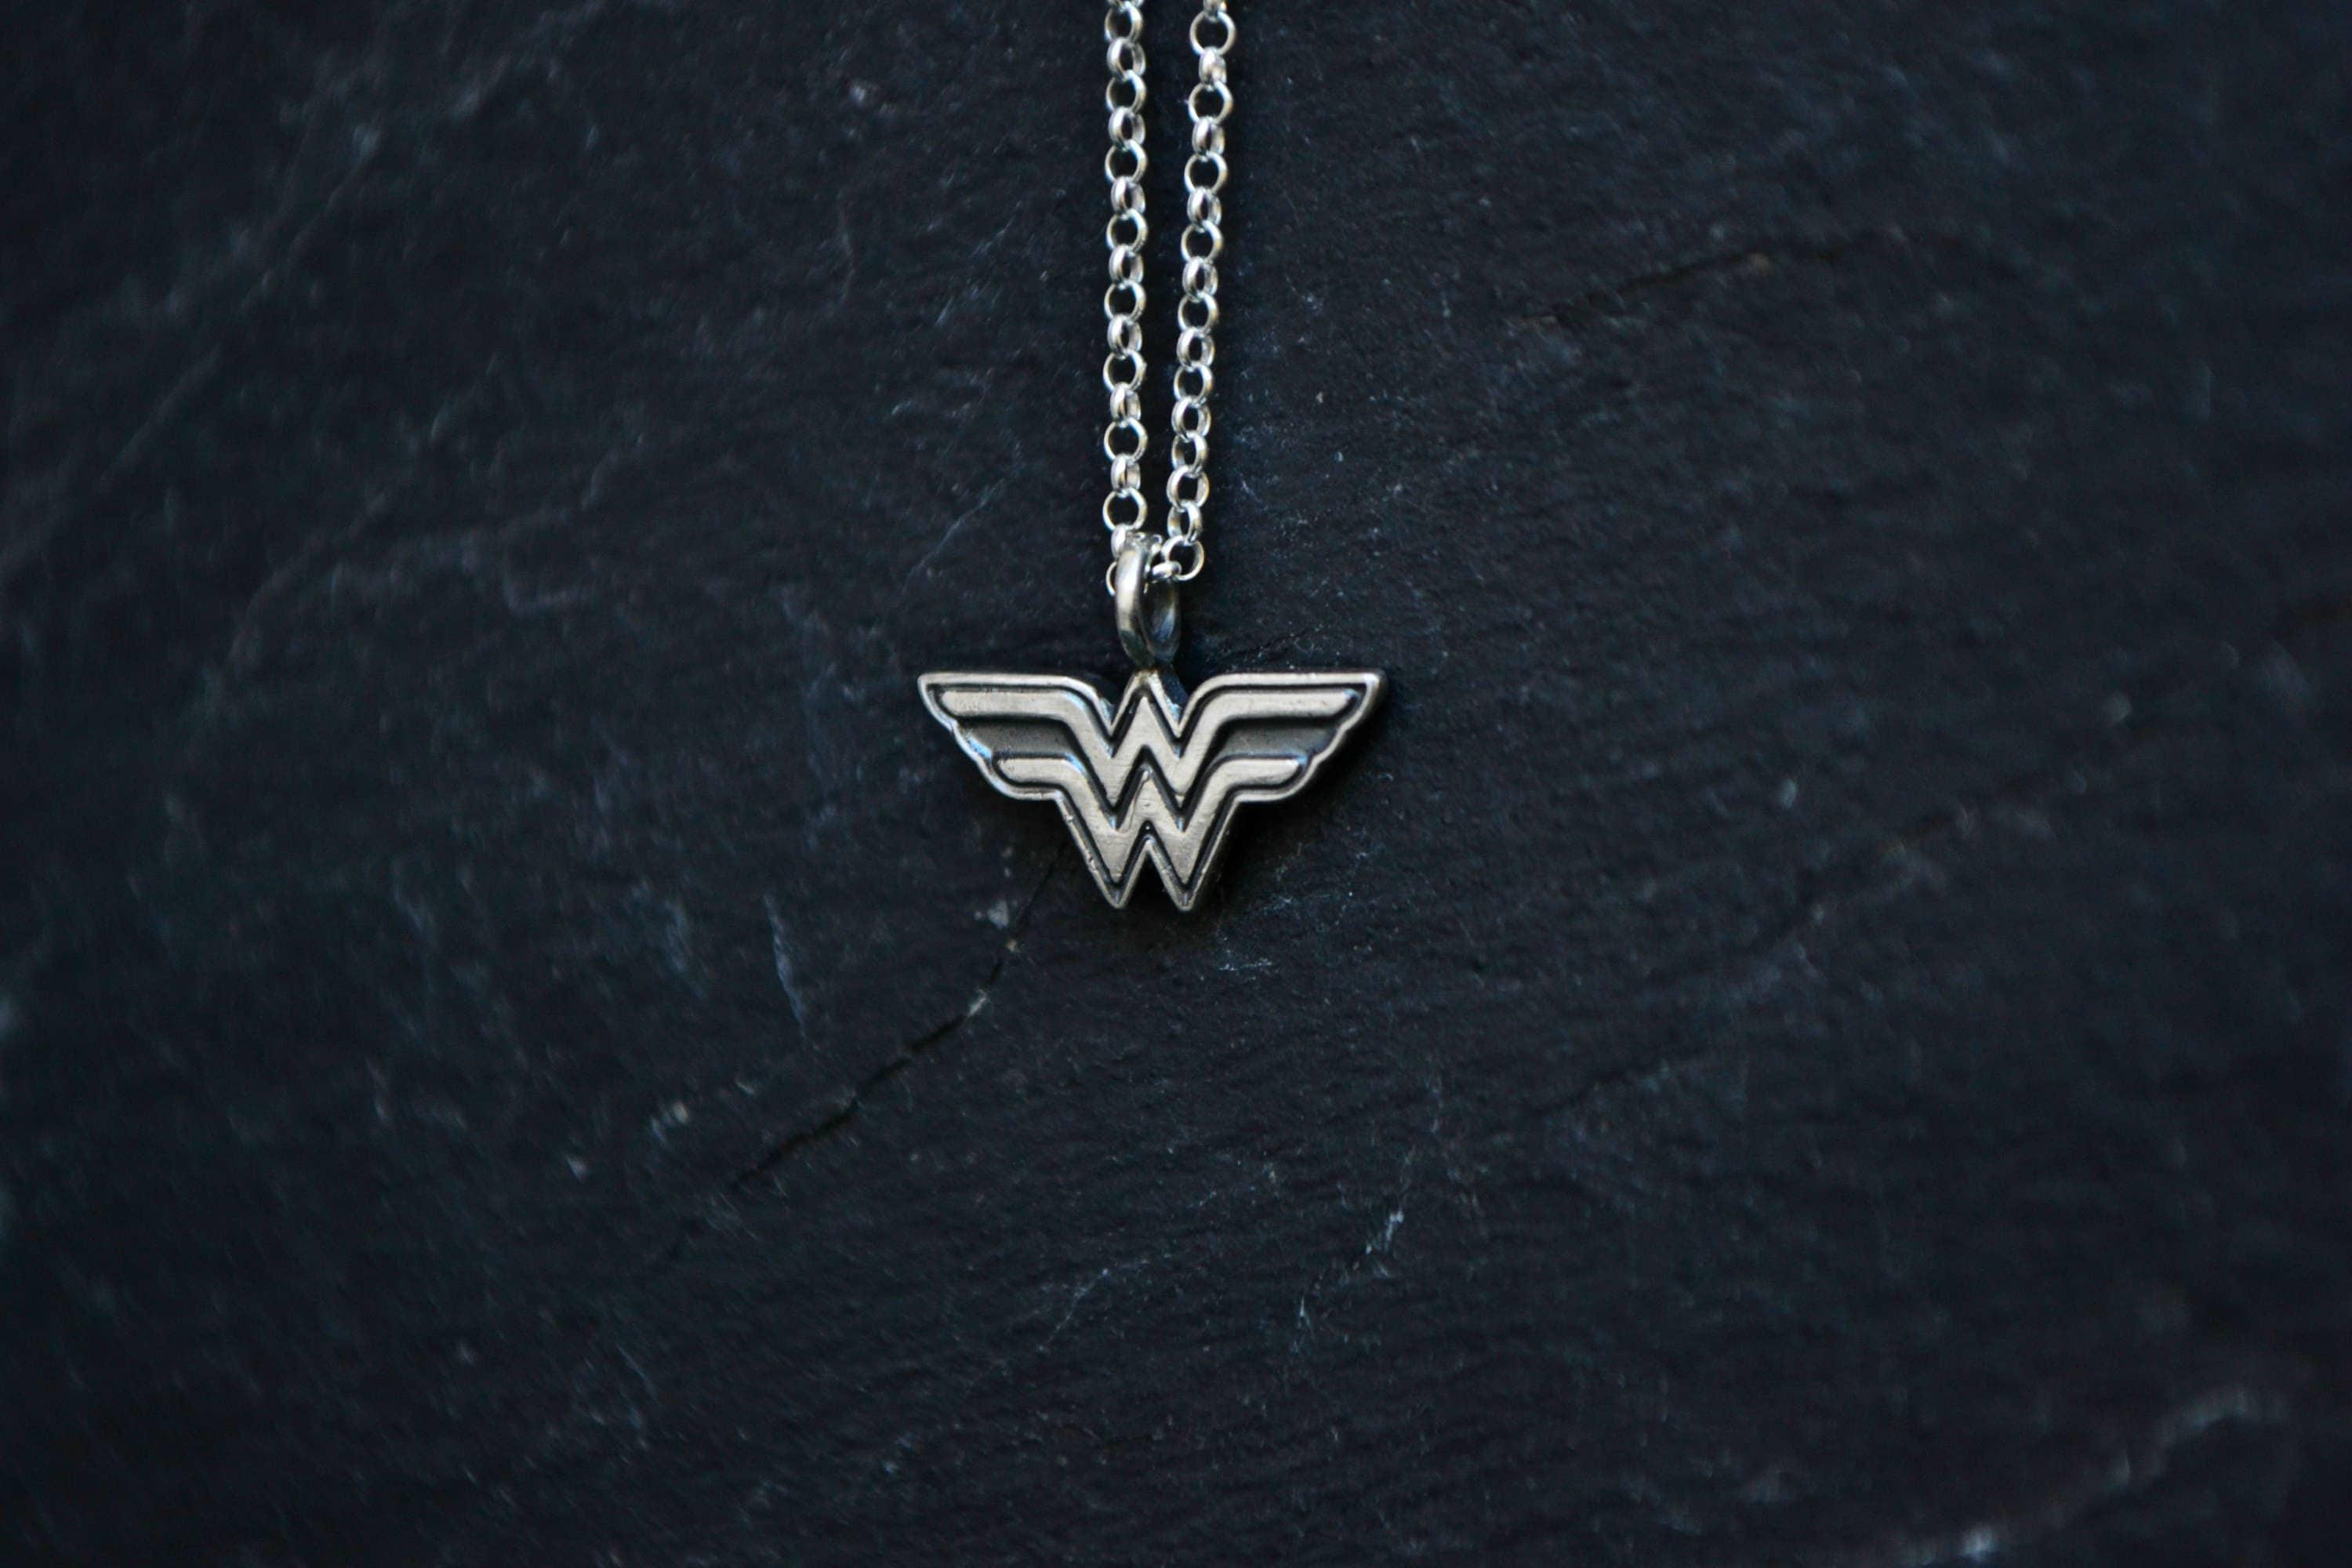 Collier de femme de merveille super h ros wonder femme en etsy - Liste de super heros femme ...